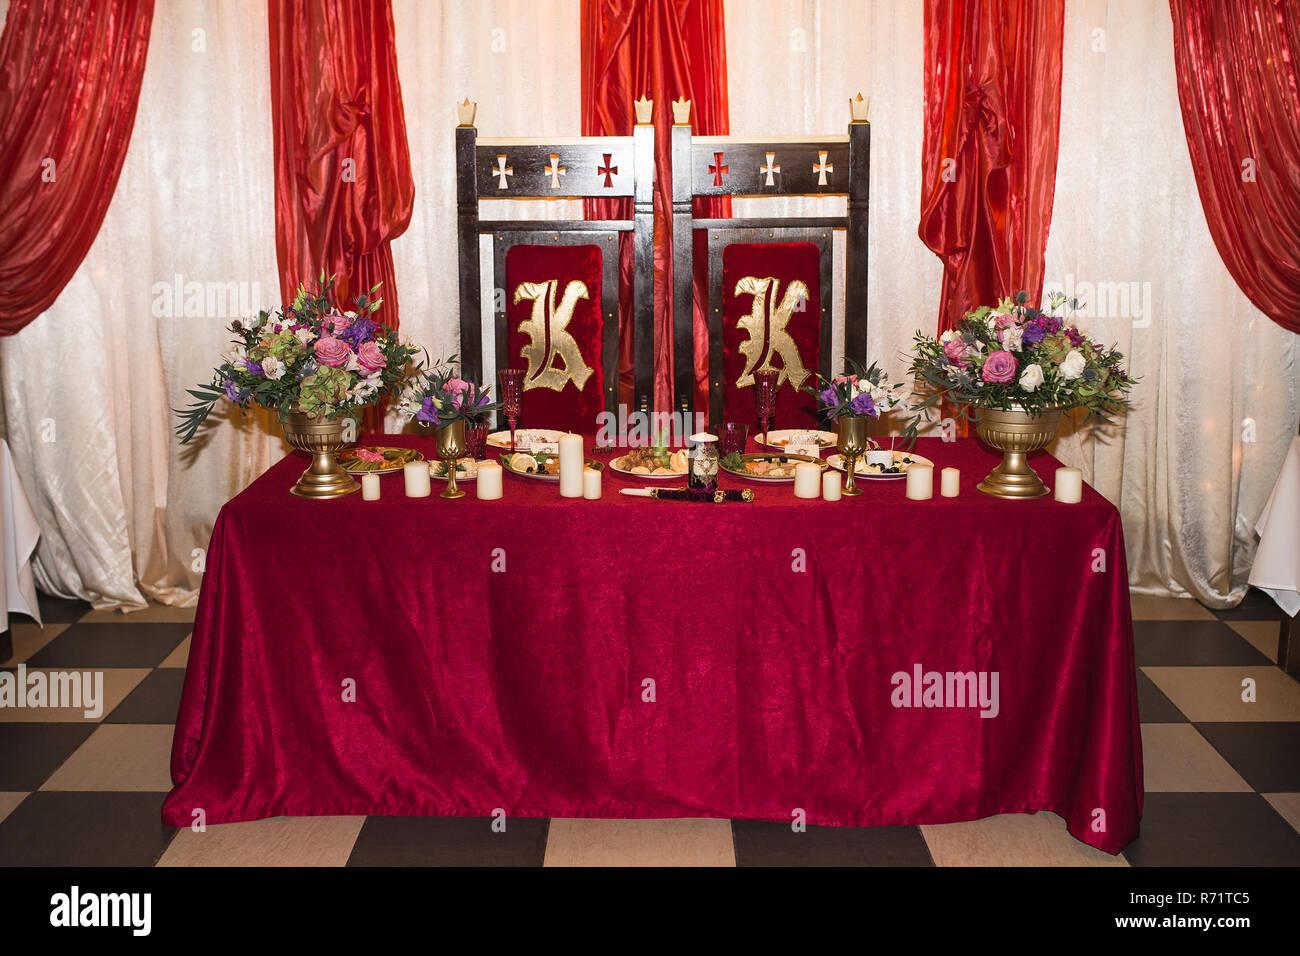 Dekoration Auf Hochzeitsfeier Stockfoto Bild 228078485 Alamy